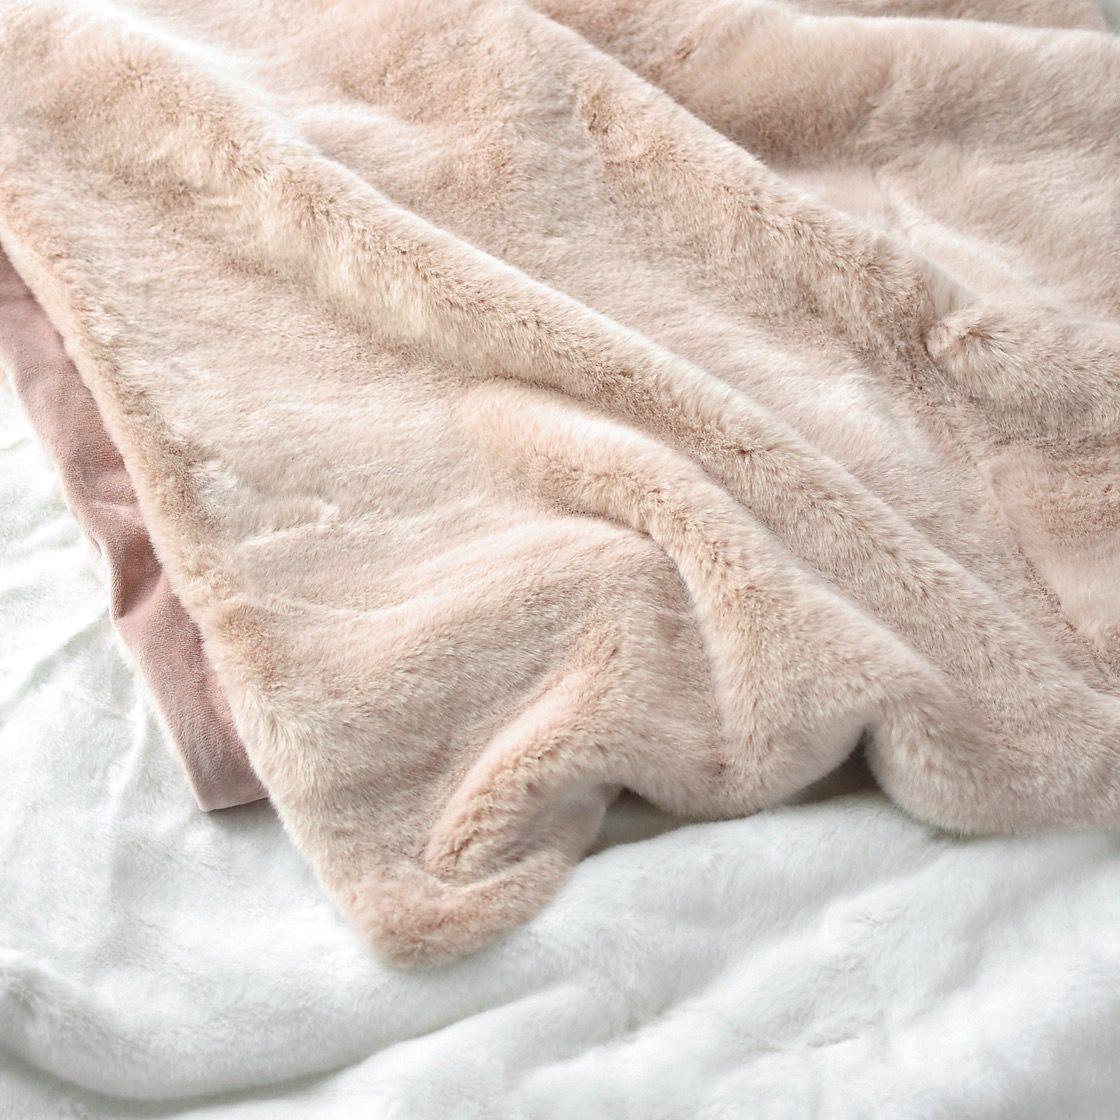 Blush Pink Throw Blanket Blush Pink Dusty Rose Gold Faux Fur Throw Blanket A Cozy Millennial